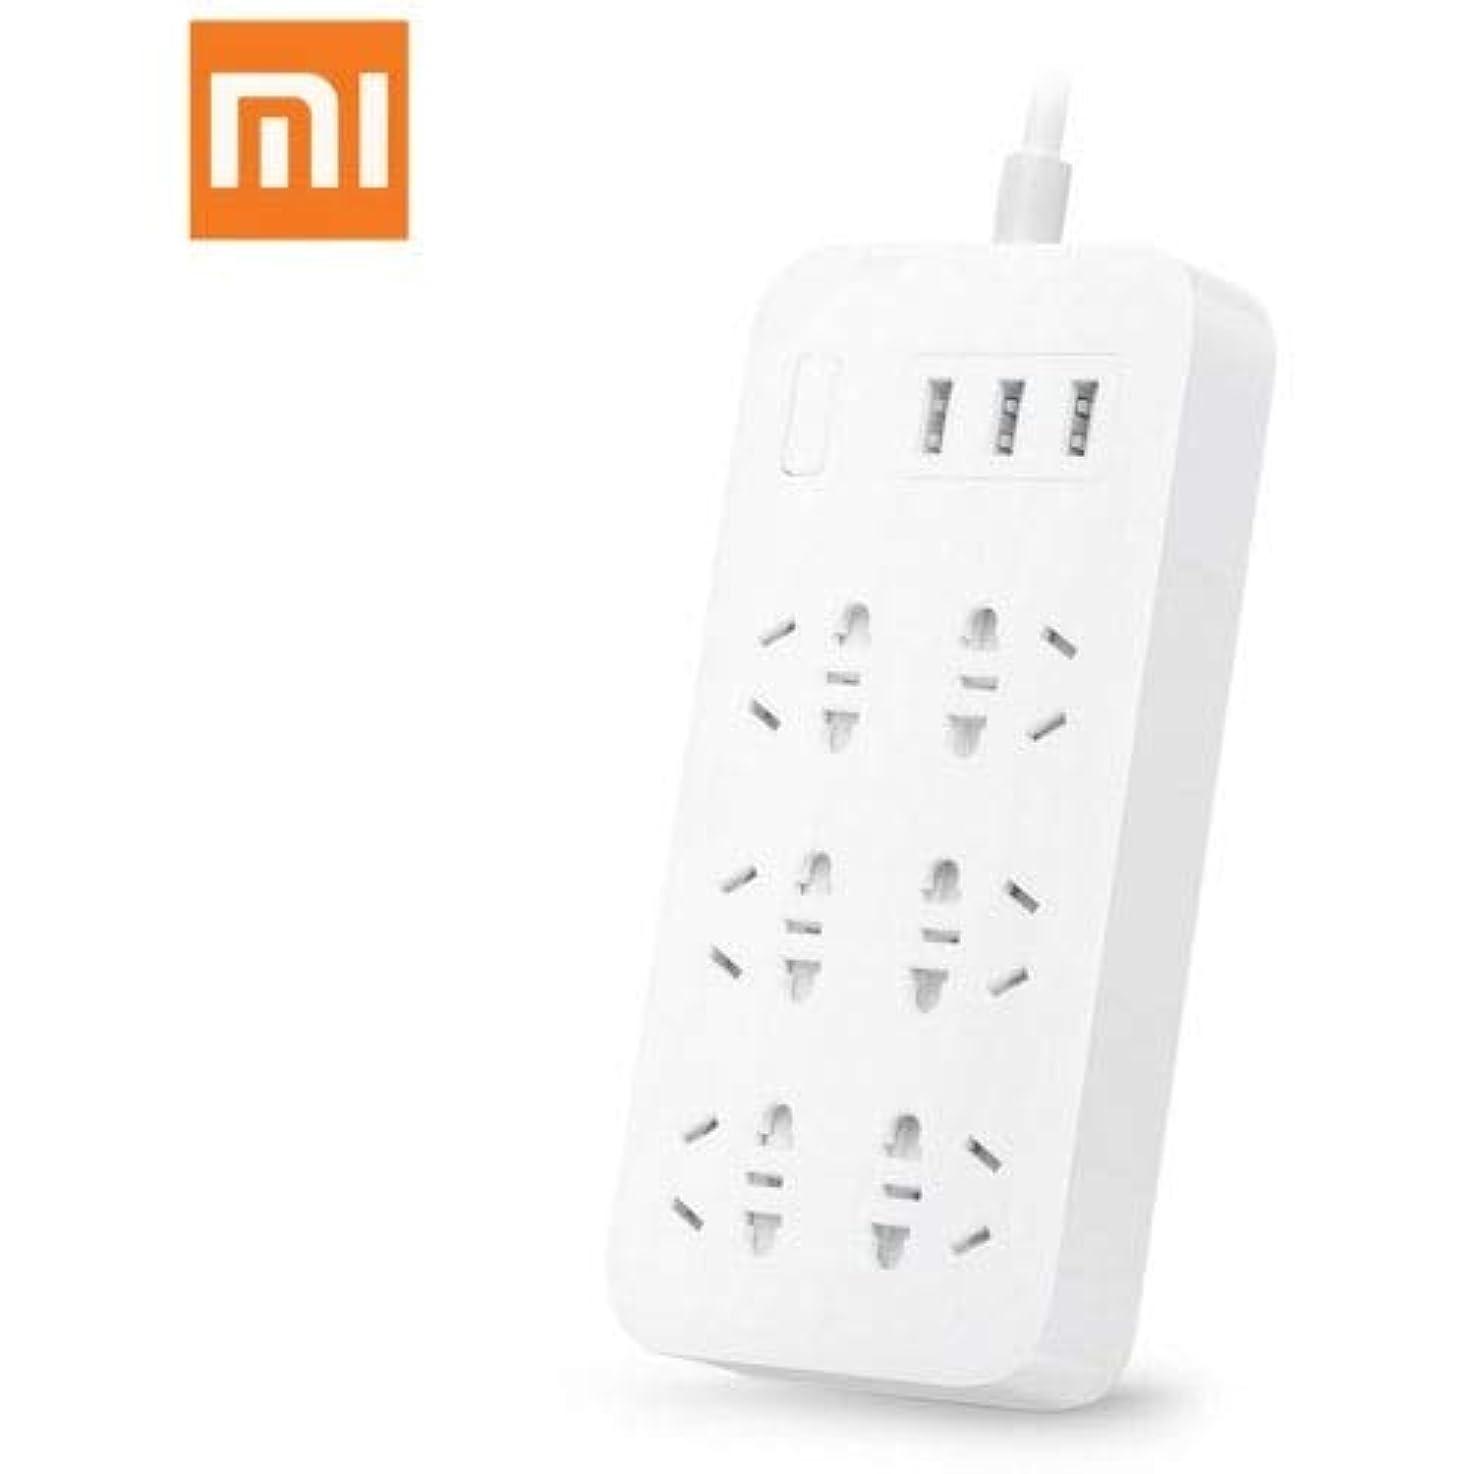 Original Xiaomi CXB6-1QM 6-outlet Power Strip